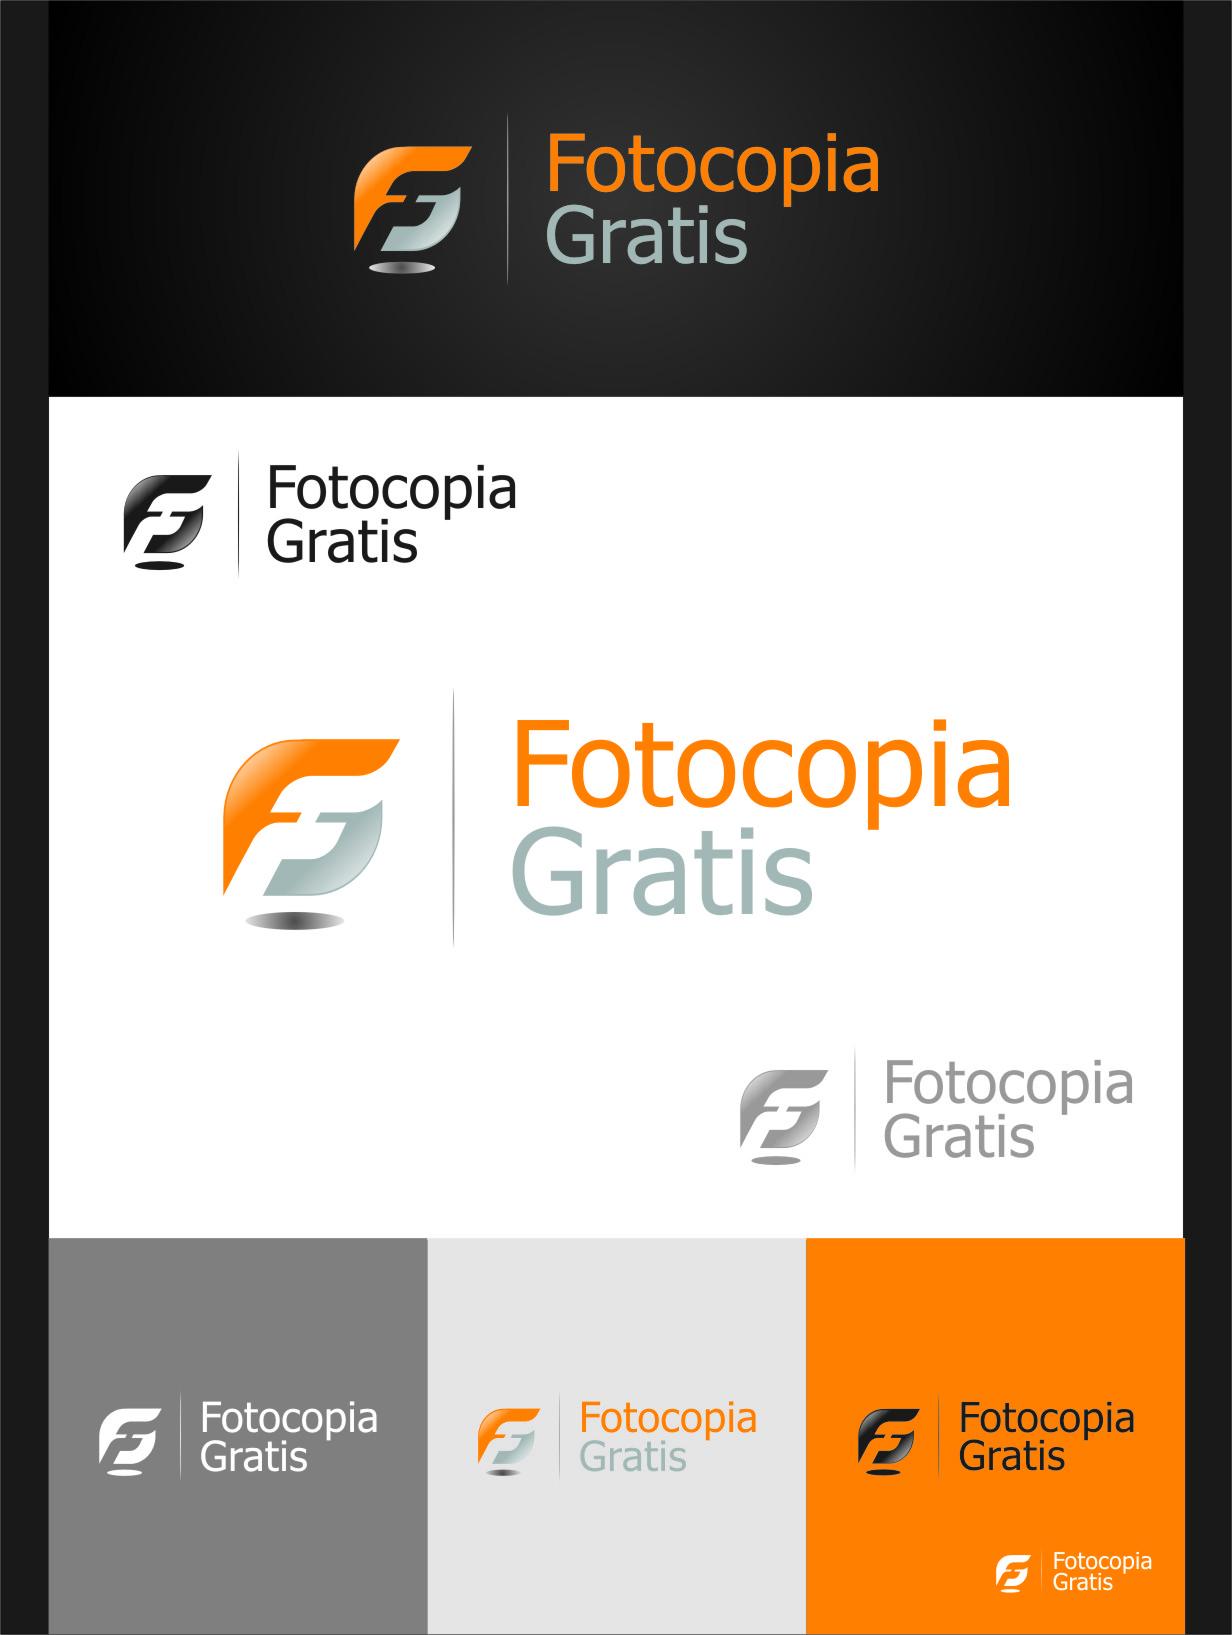 Logo Design by Ngepet_art - Entry No. 177 in the Logo Design Contest Inspiring Logo Design for Fotocopiagratis.